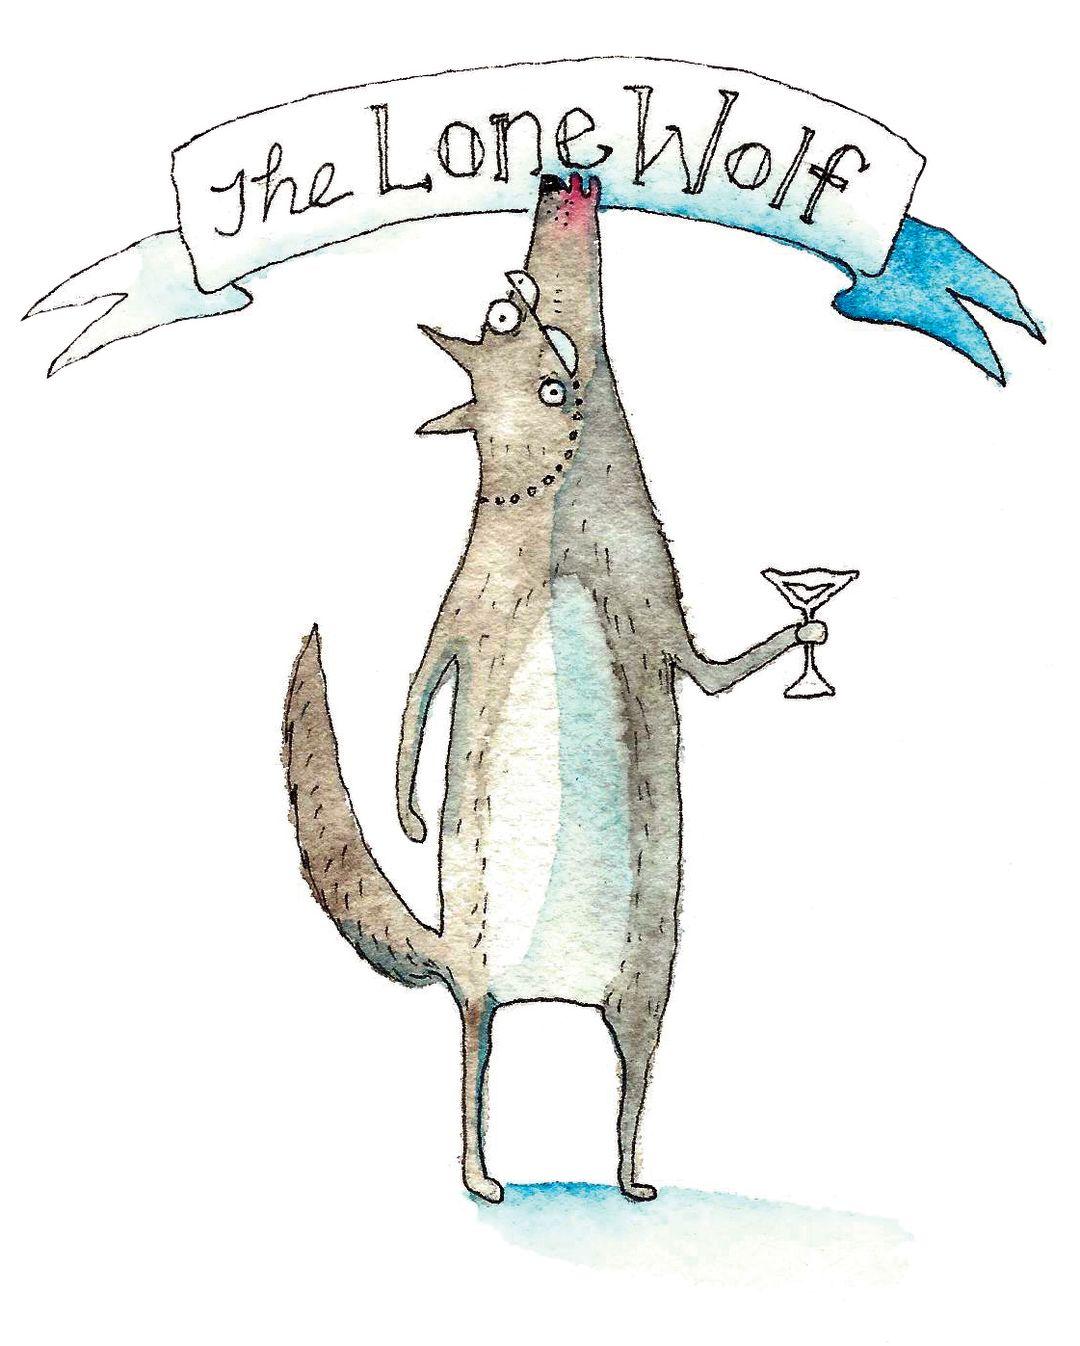 Lonewolf eomu4o